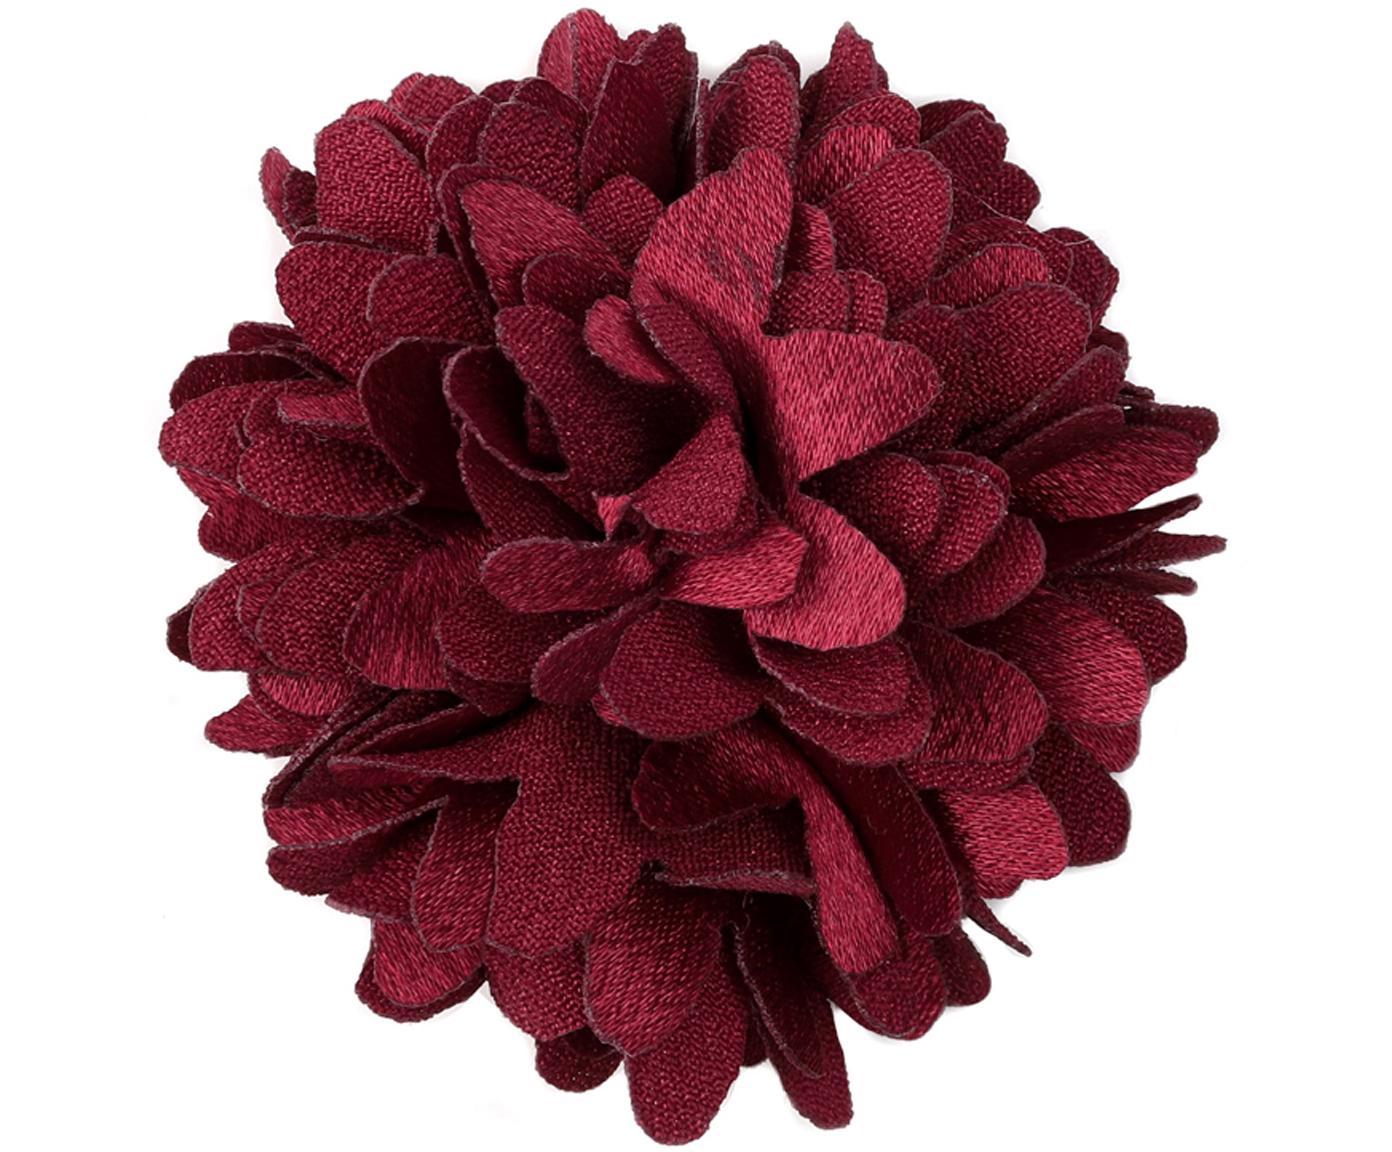 Decoratieve bloemen Flor, 6 stuks, Polyester, Rood, Ø 6 cm